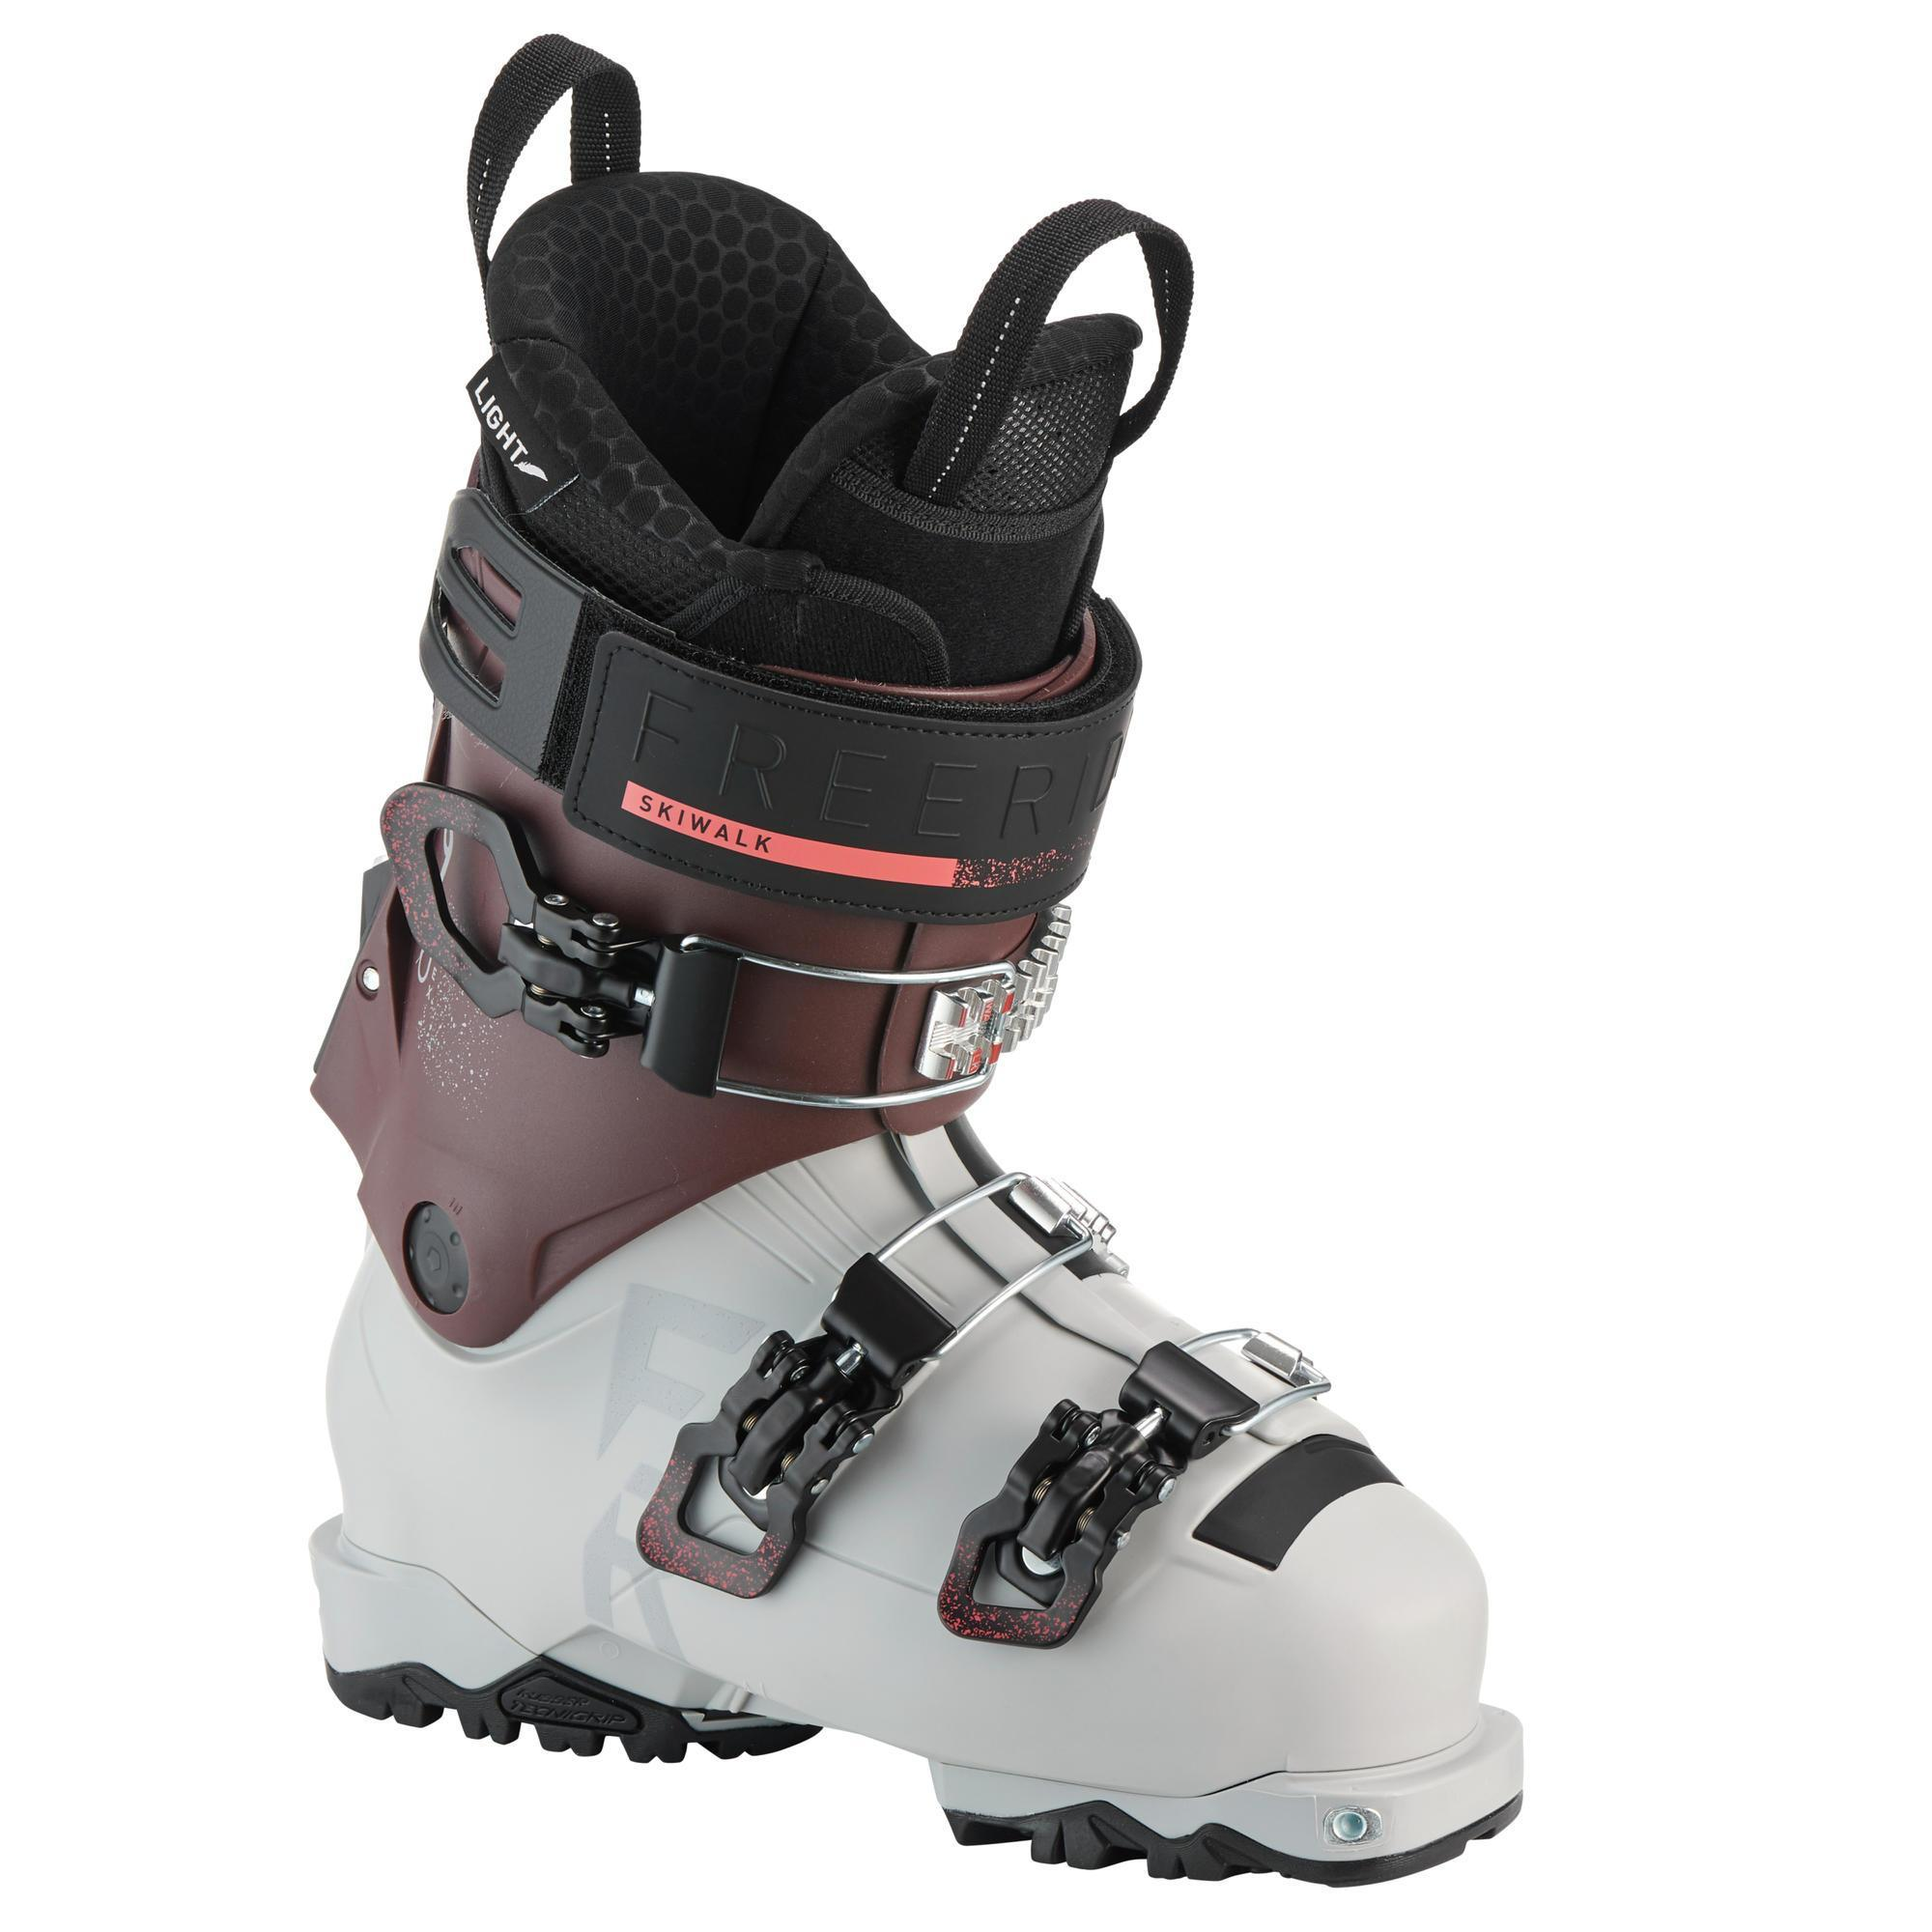 Chaussures de ski Freeride randonnée femme SKB SKI FR900 LT F flex 90 - Wedze